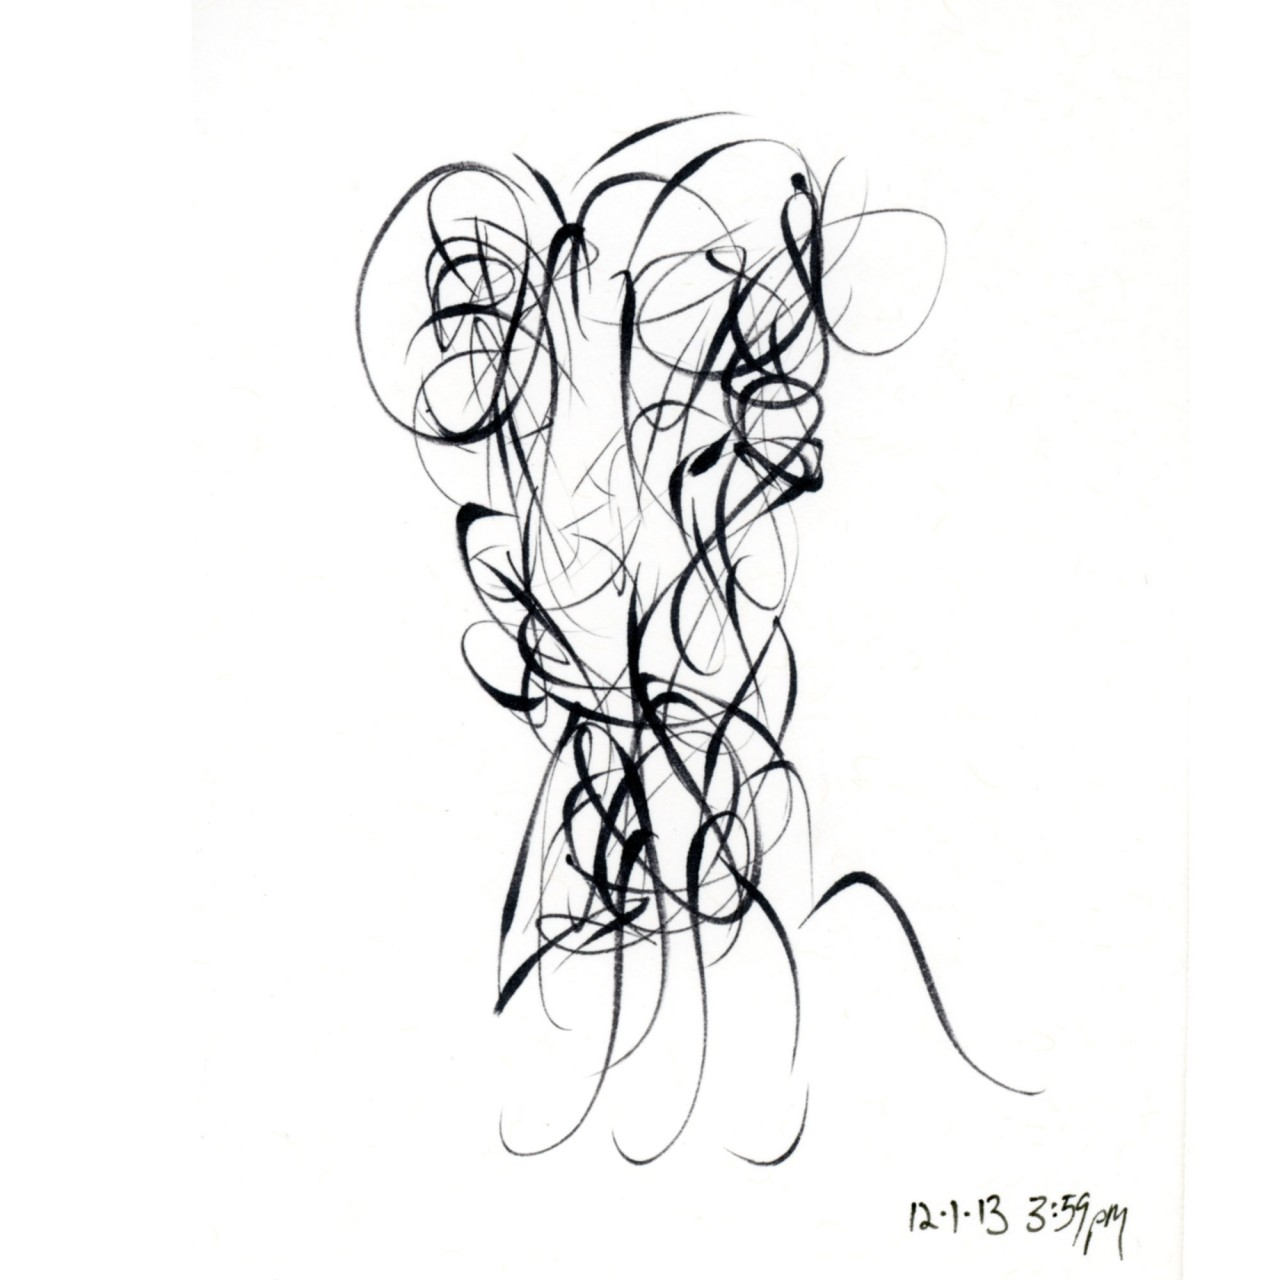 2013-12-01_3-44pm010